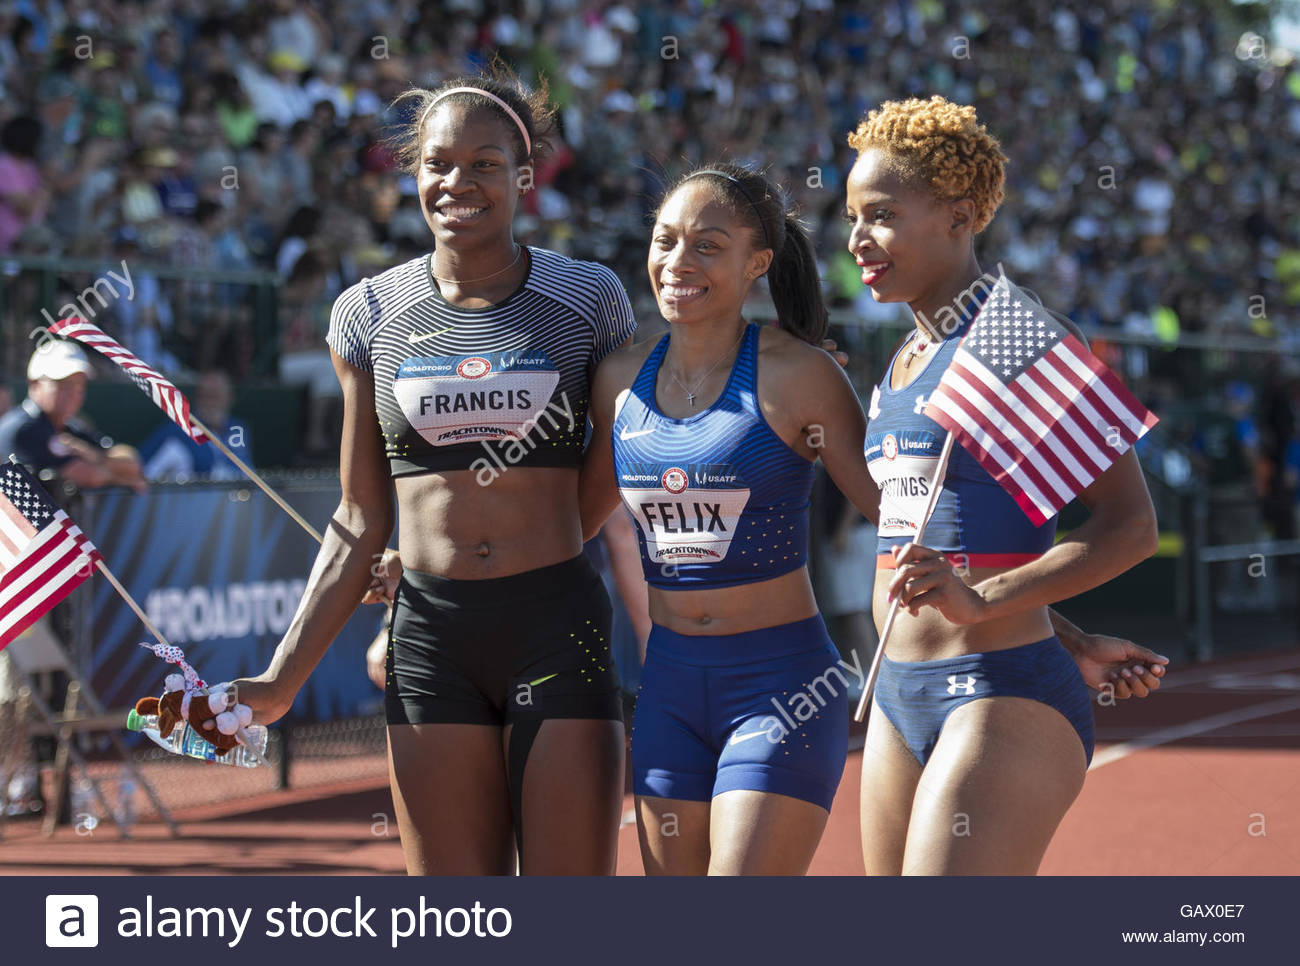 Eugene, Oregon, USA. 3rd July, 2016. USATF Olympic Trials, Eugene, Oregon- (left-right) PHYLLIS FRANCIS (second - Stock Image